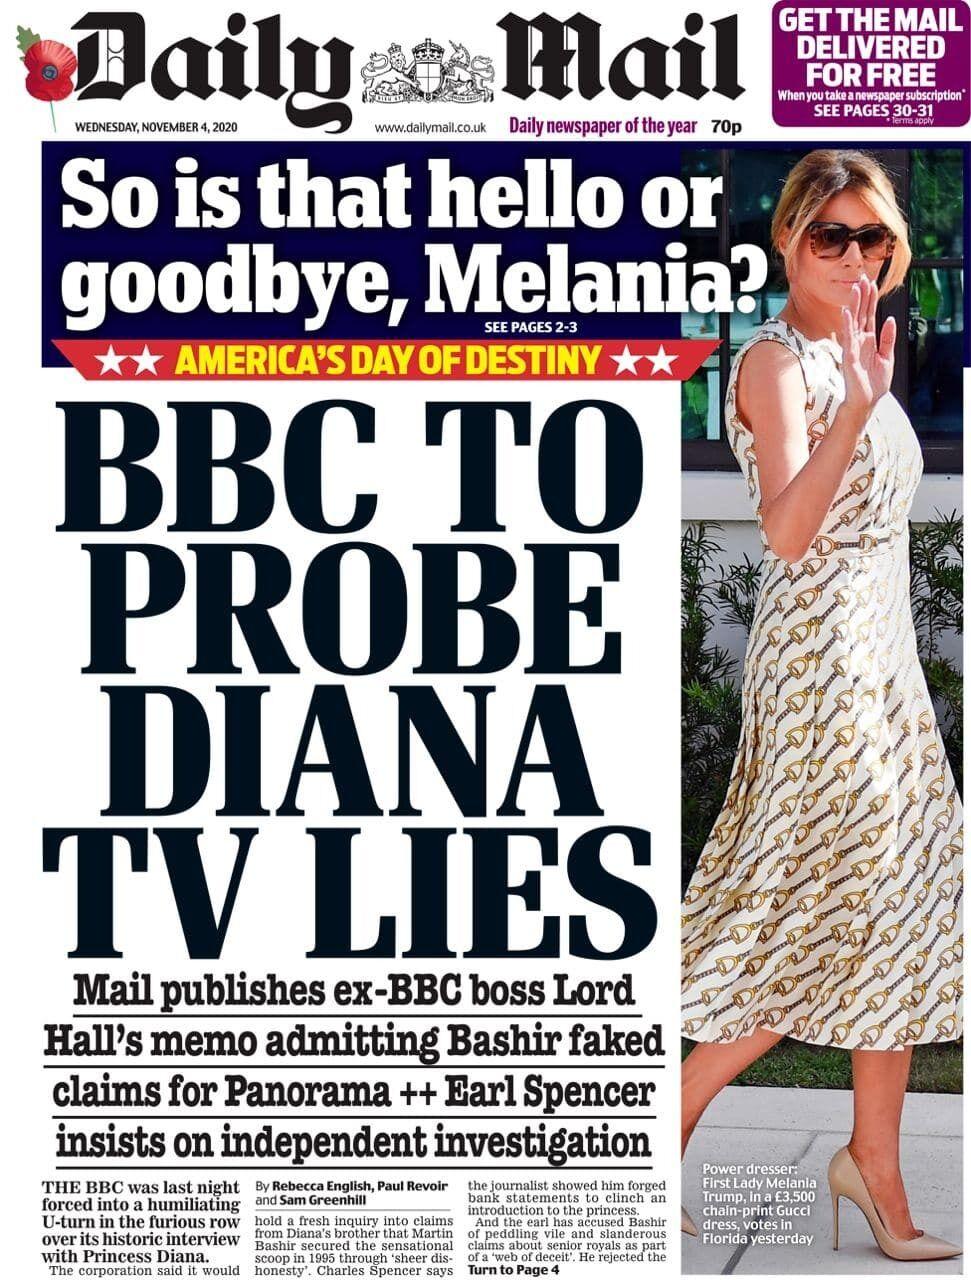 Daily Mail отреагировало на выборы шуткой о жене Трампа